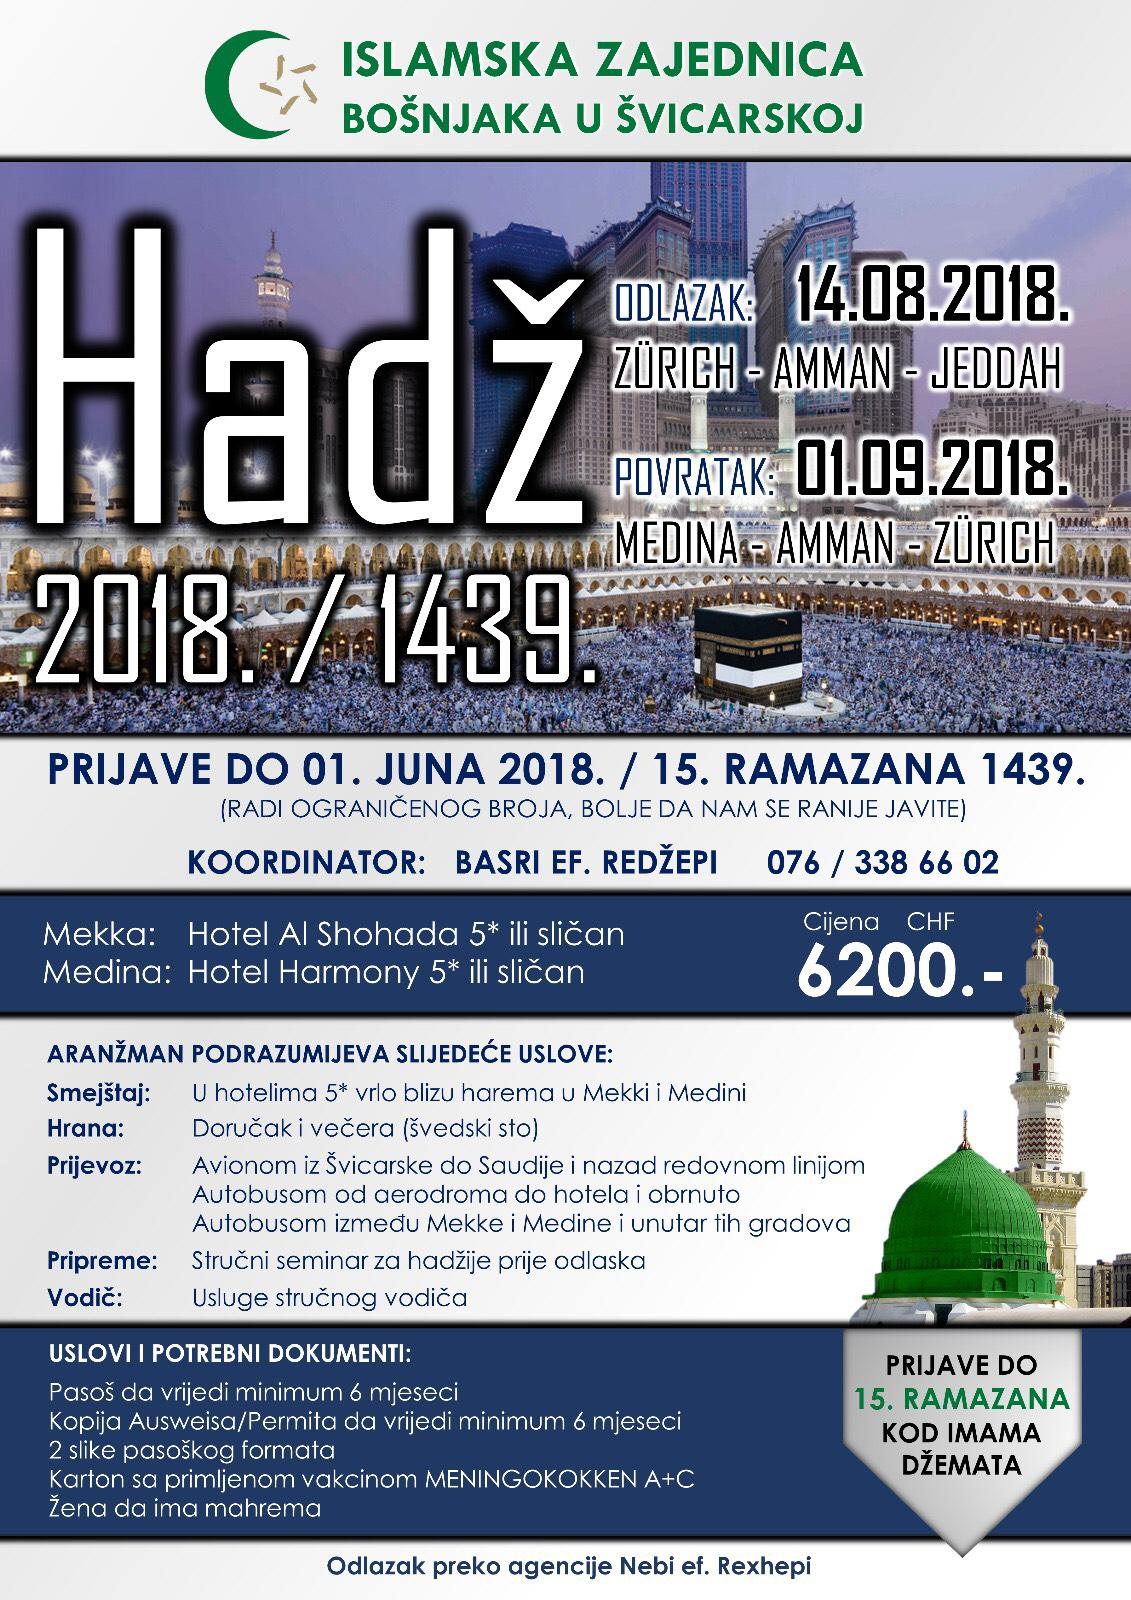 Hadž 2018 @ makkah | Mekka | Makkah Province | Saudijska Arabija